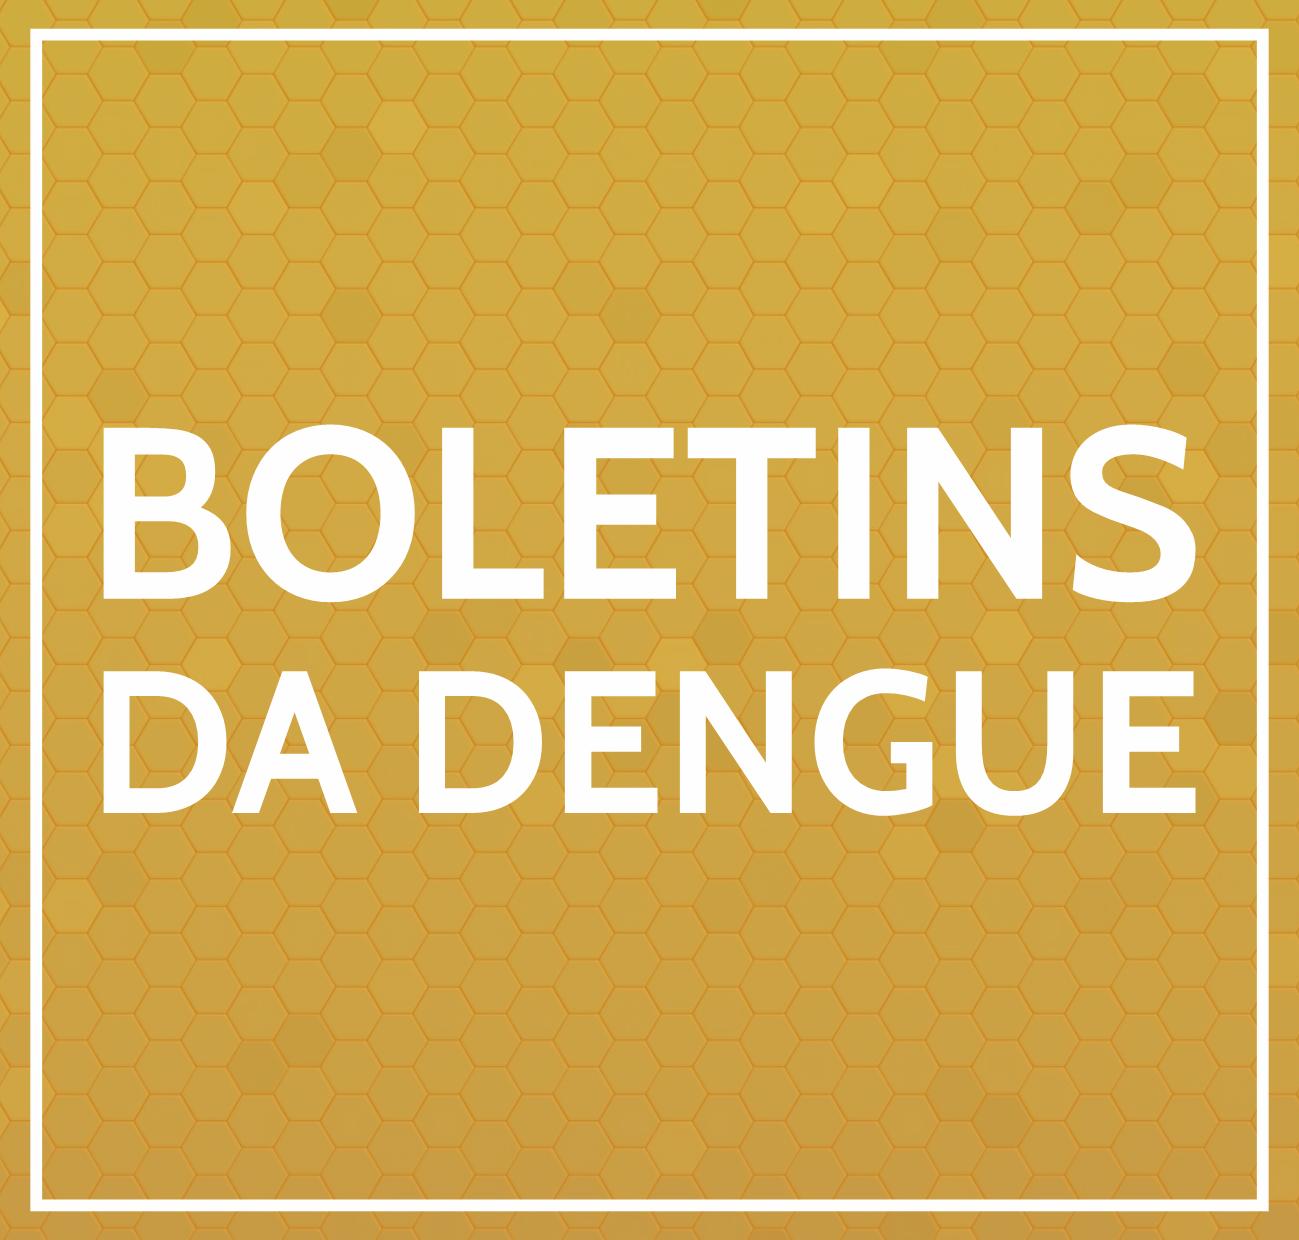 BOLETINS DA DENGUE